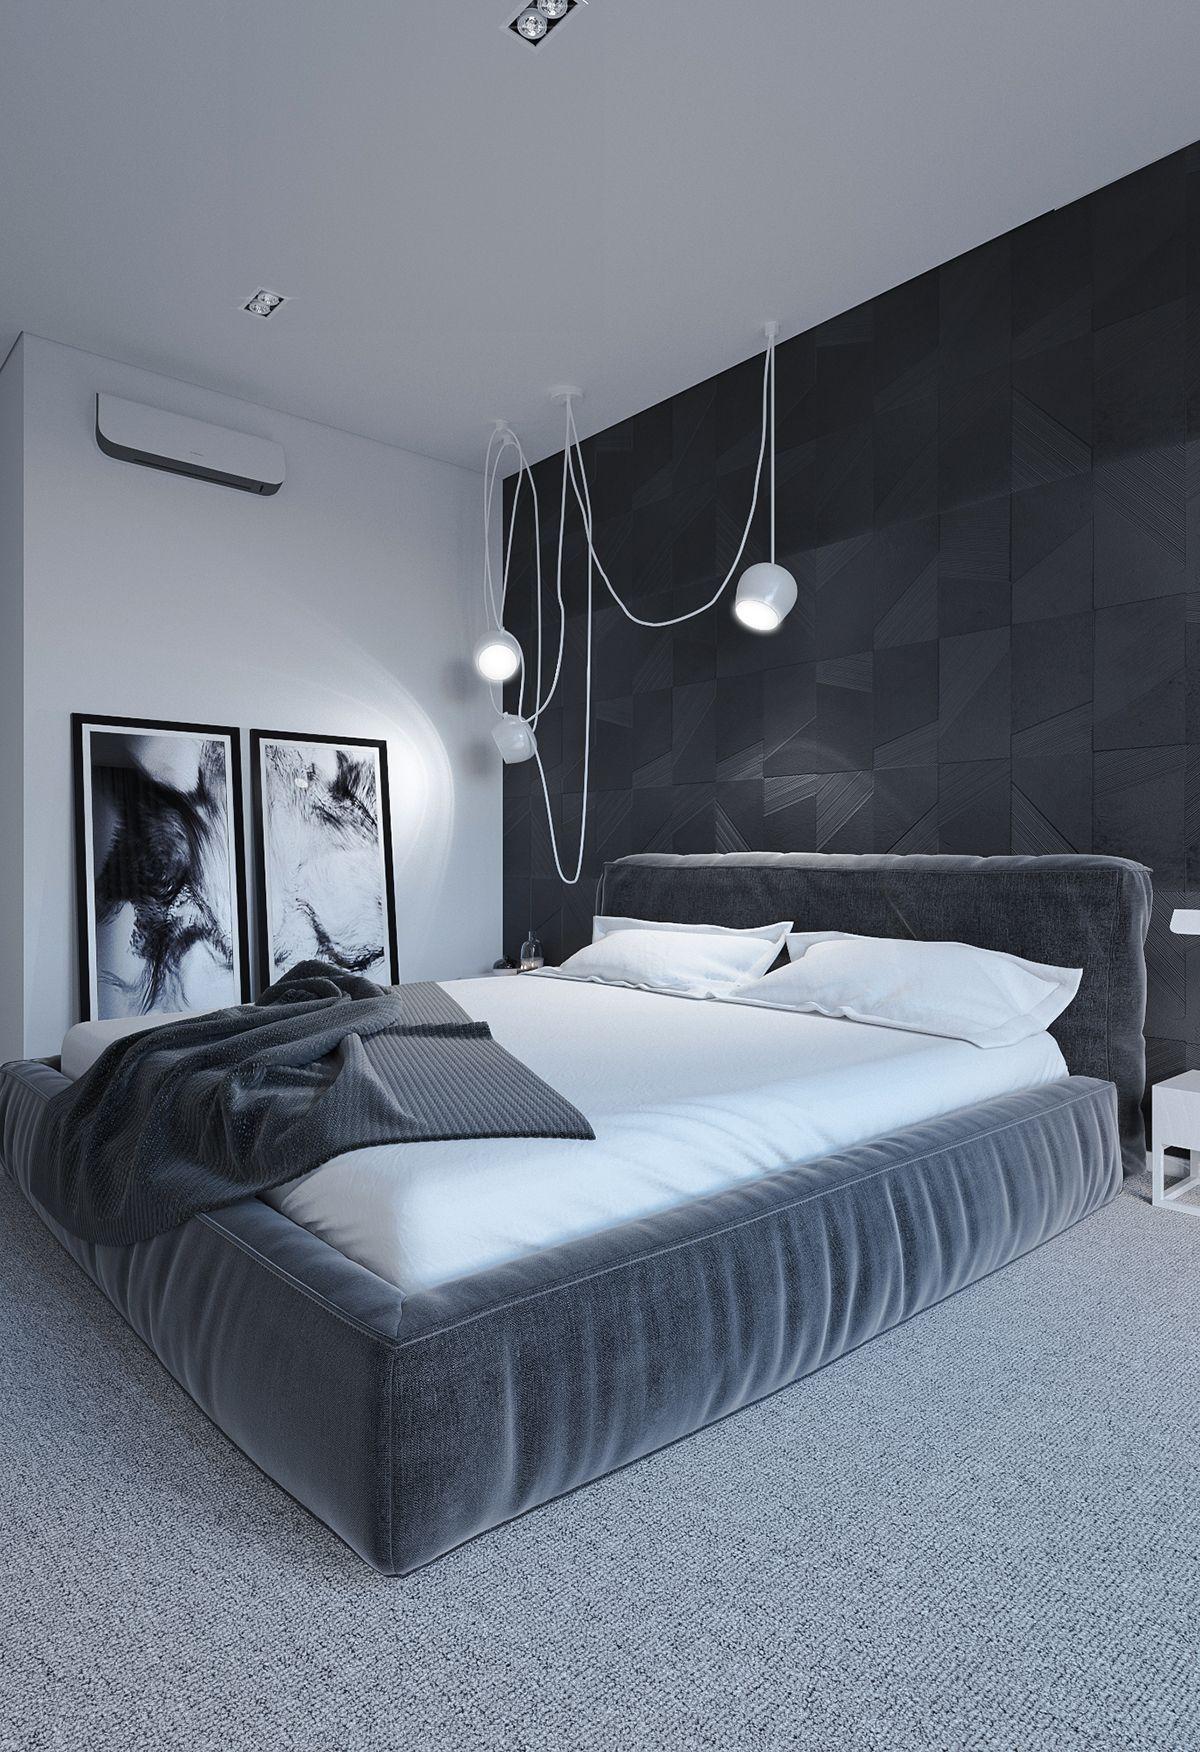 13 Awesome Minimalist Decor Scandinavian Ideas Modern Bedroom Design Luxurious Bedrooms Bedroom Interior